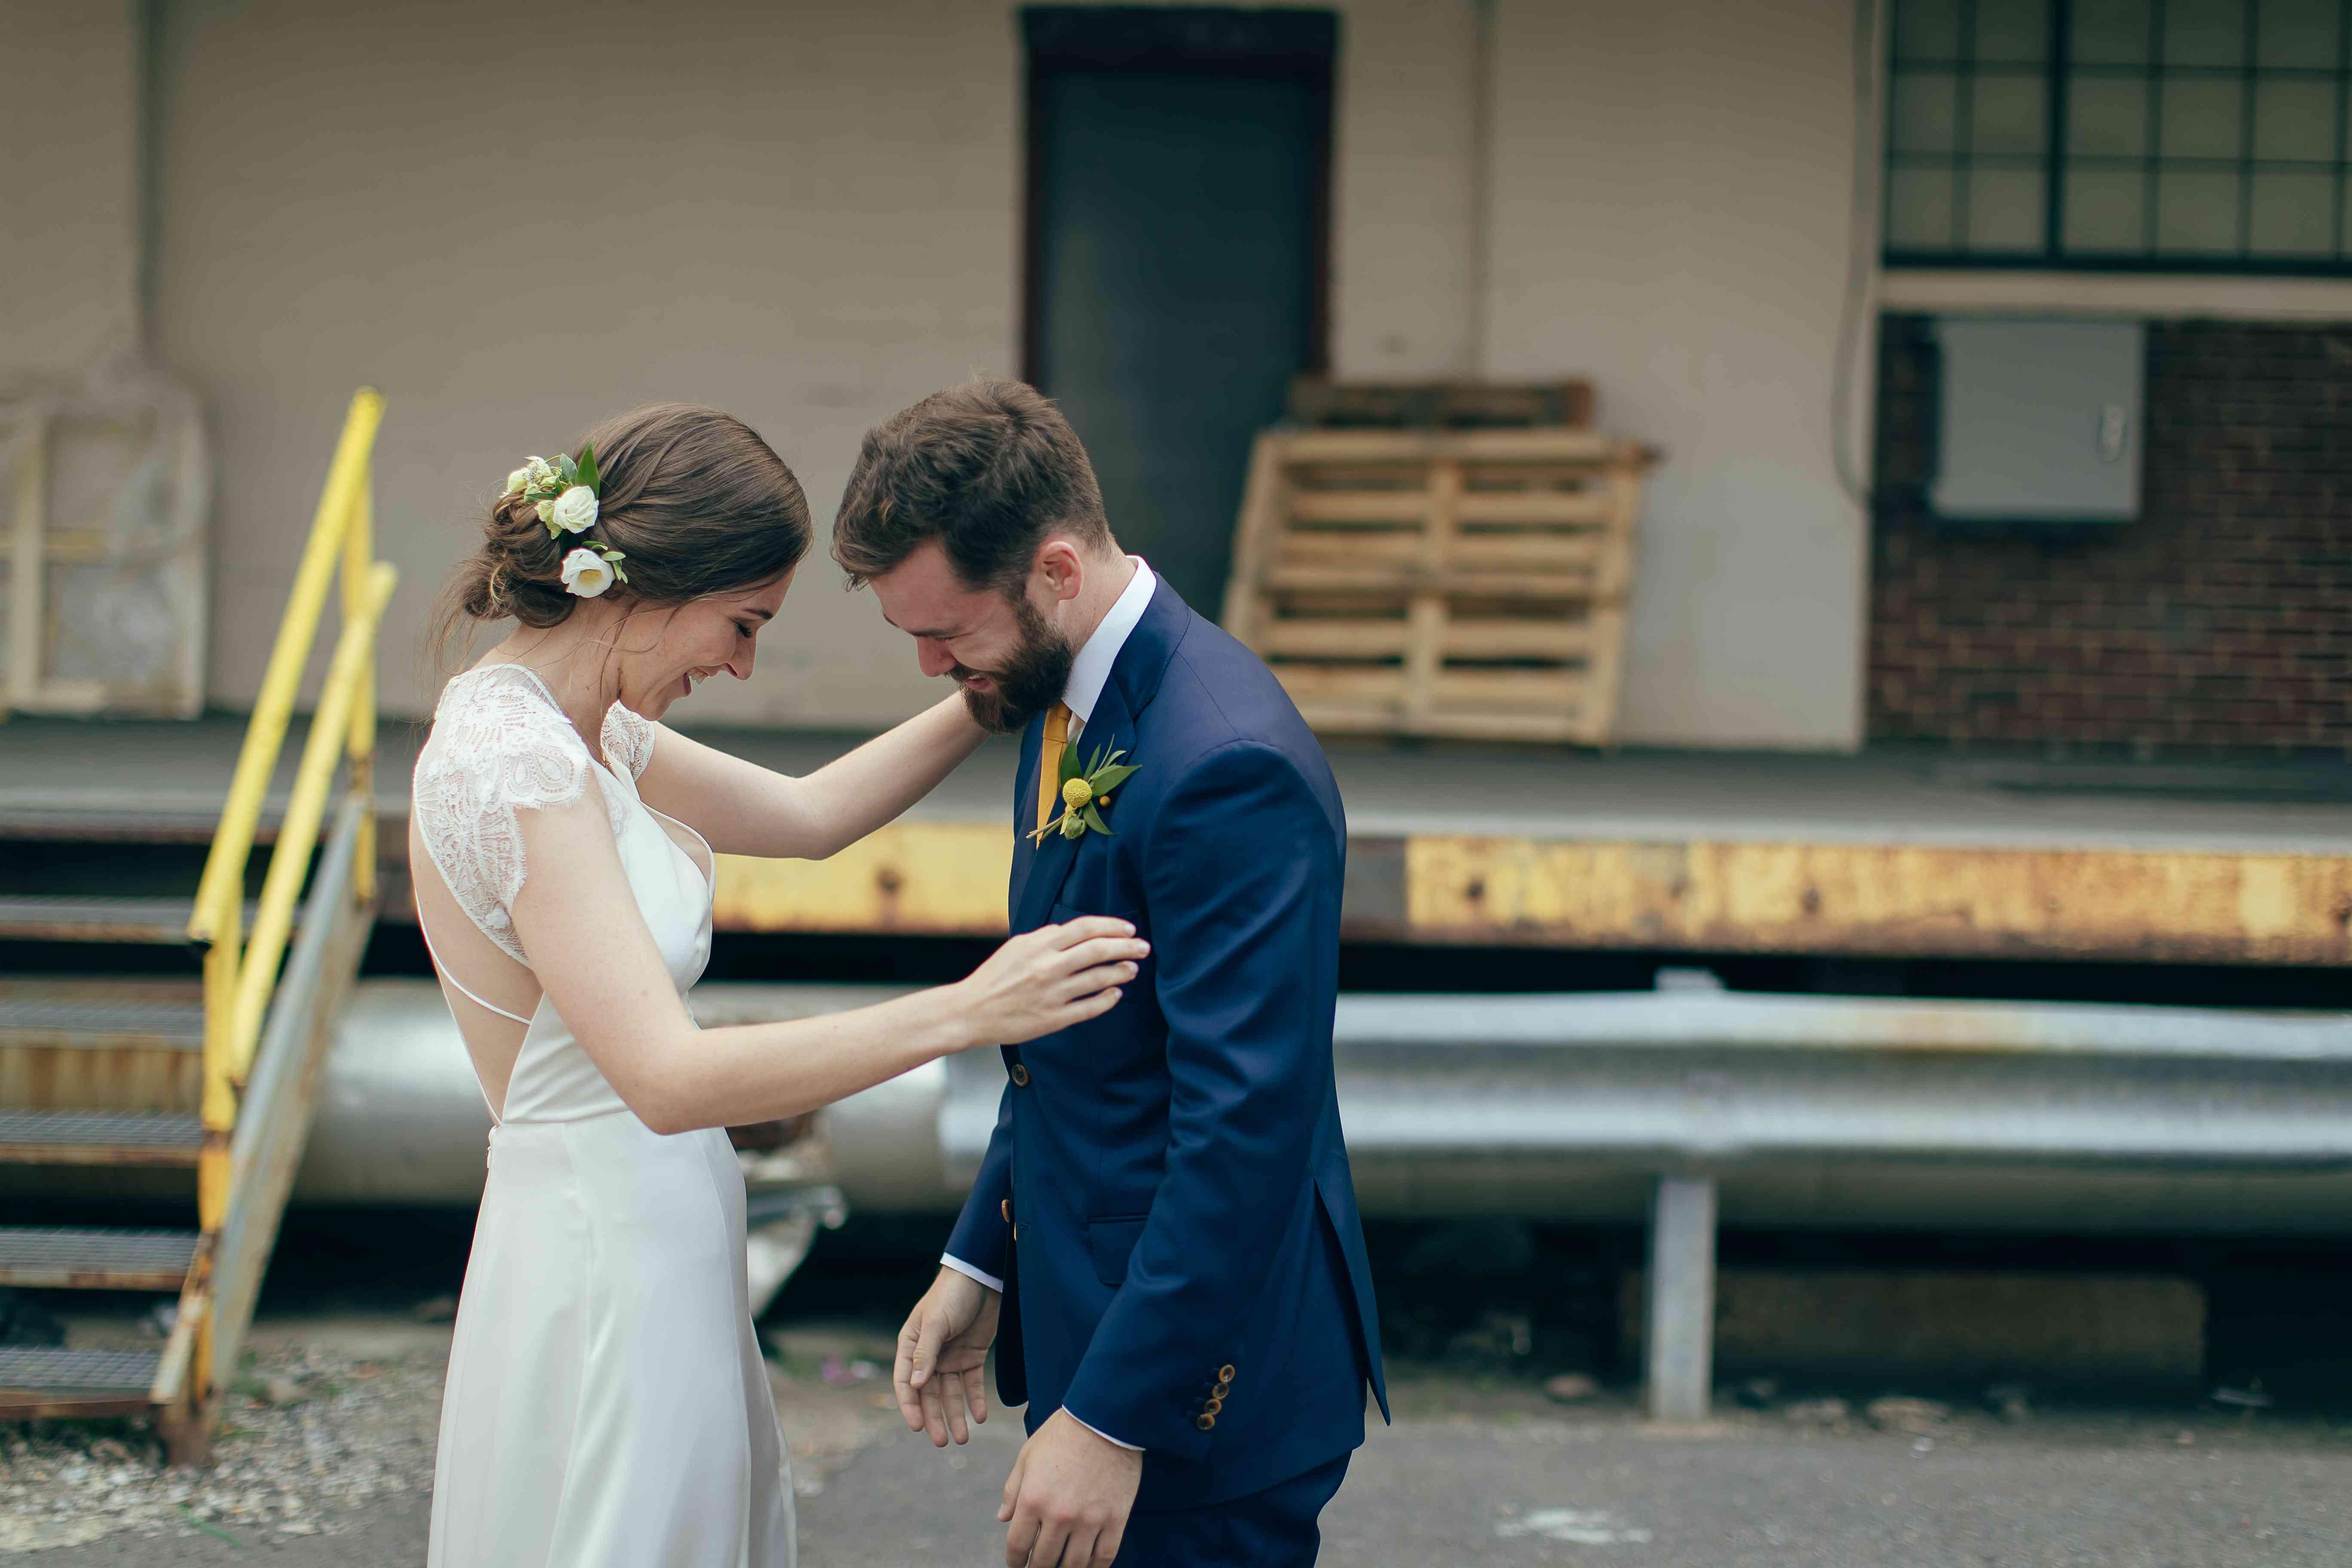 Bride and groom first look hugging